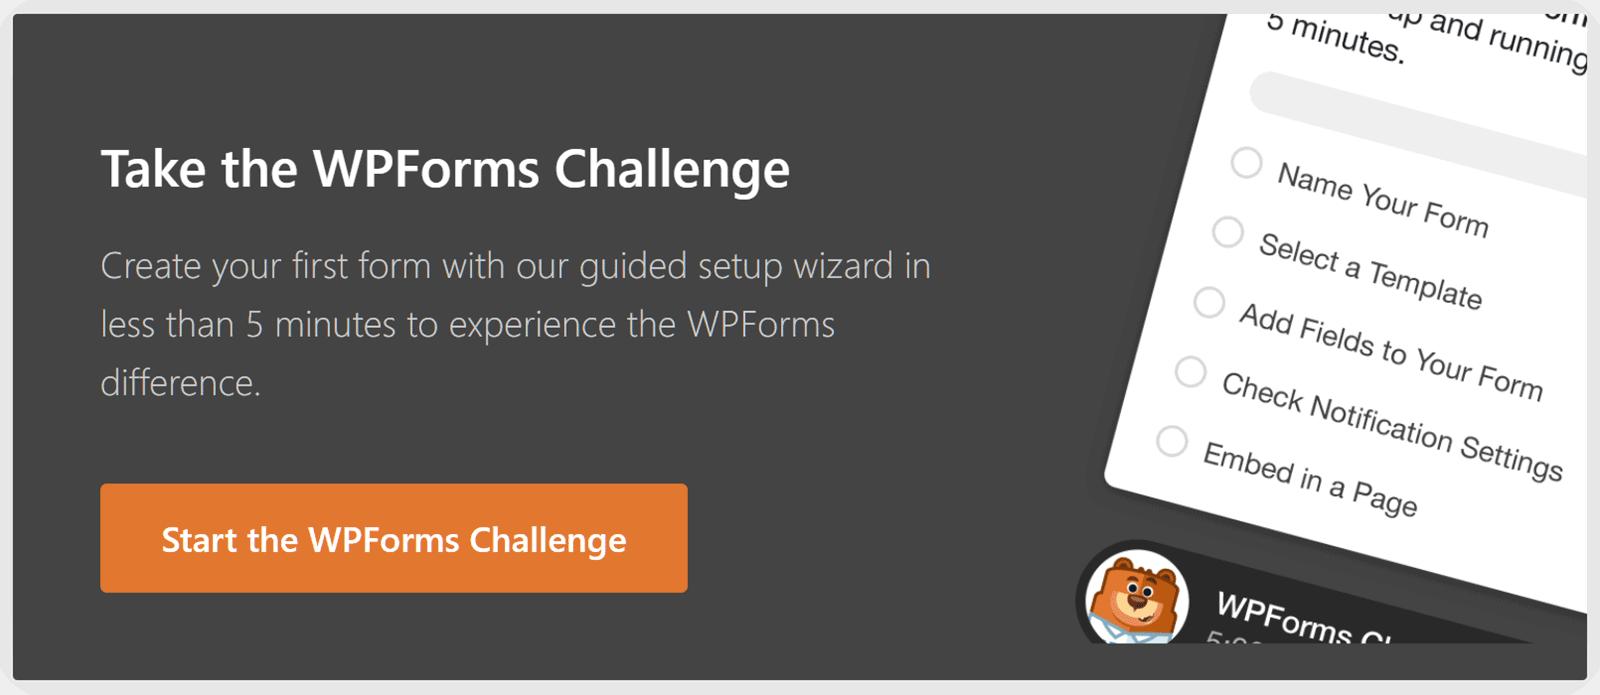 WPForms Tez Başlanğıc Çağırışı